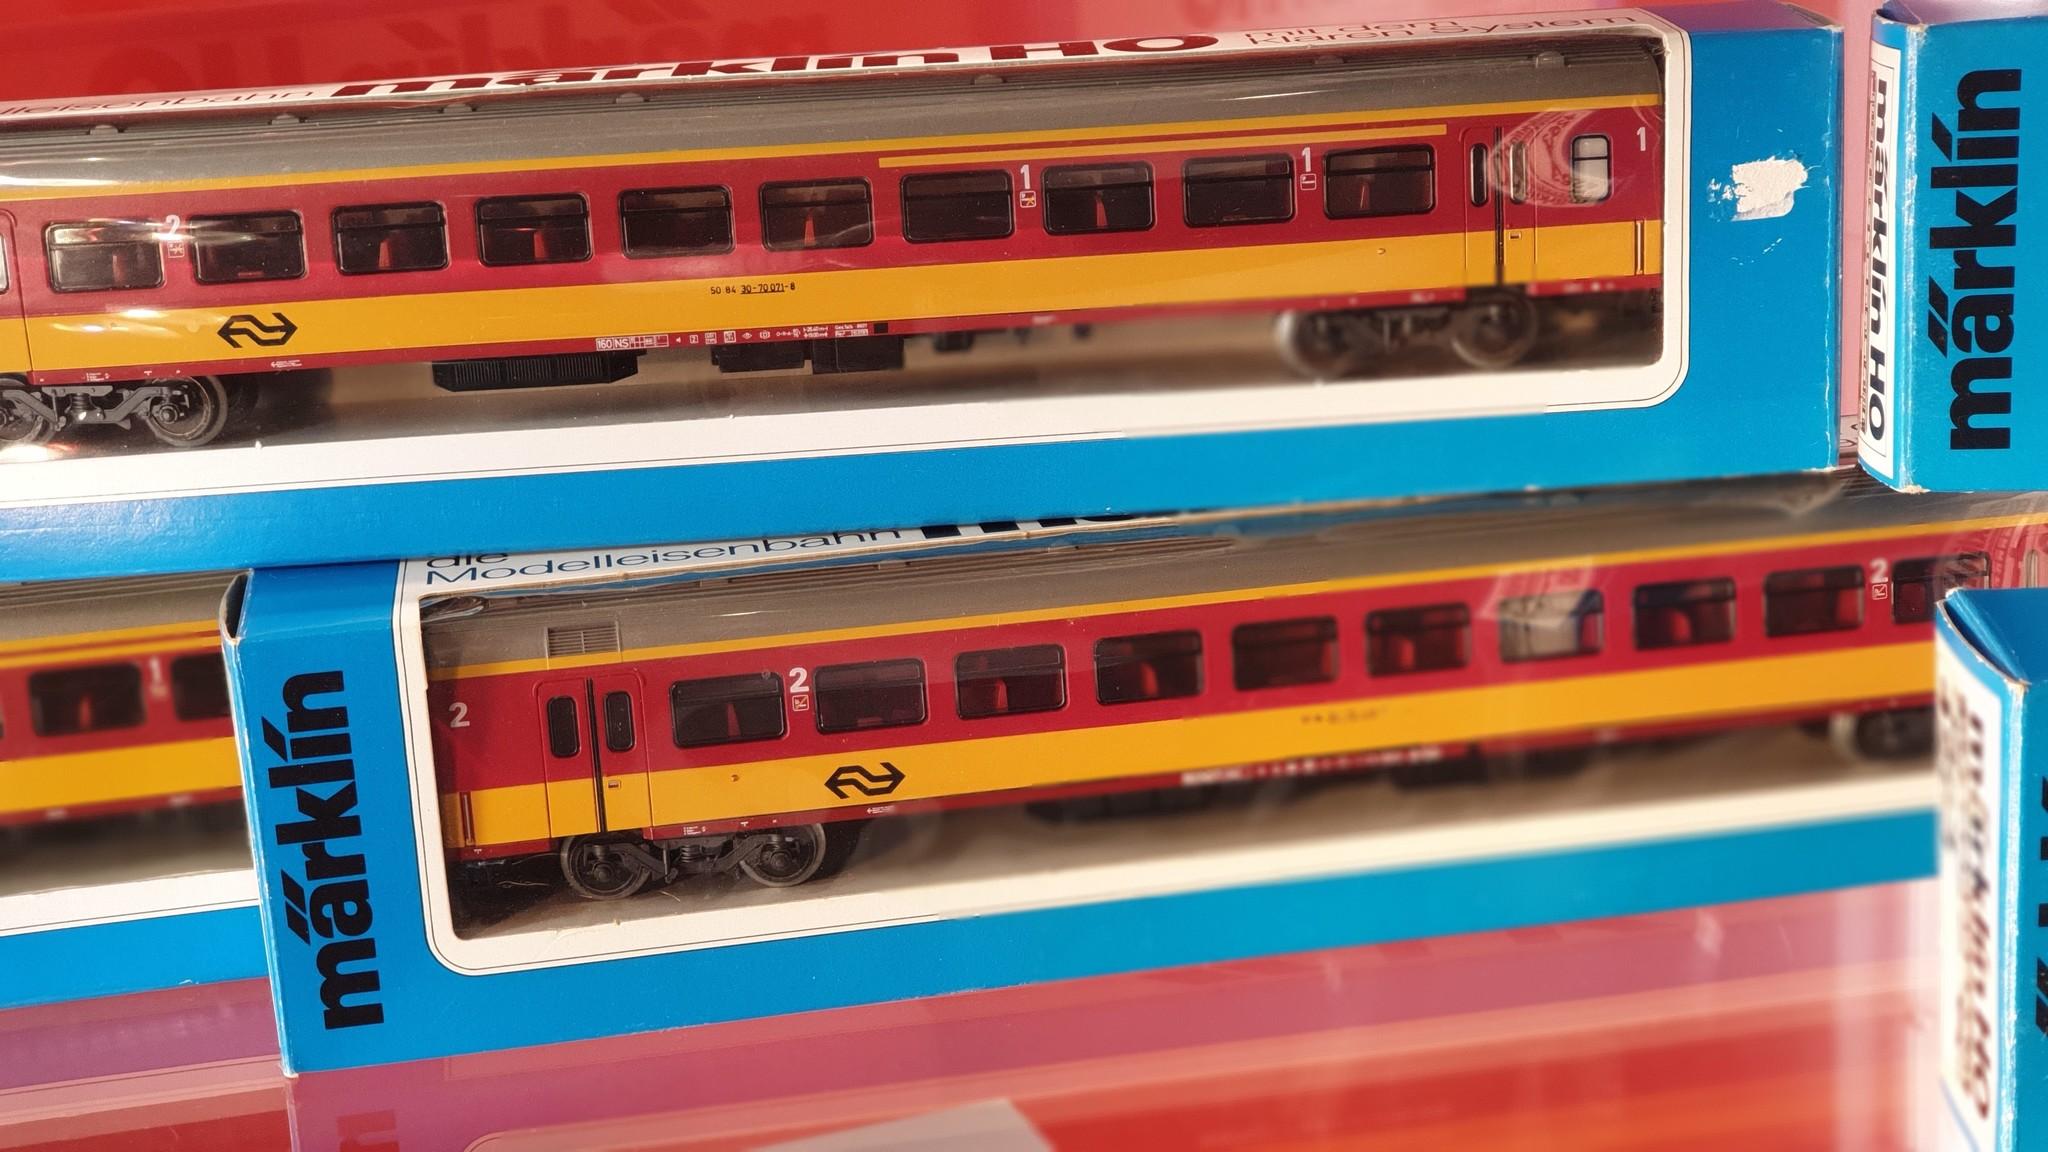 4263 Benelux Intercity rijtuig 2e klasse-1